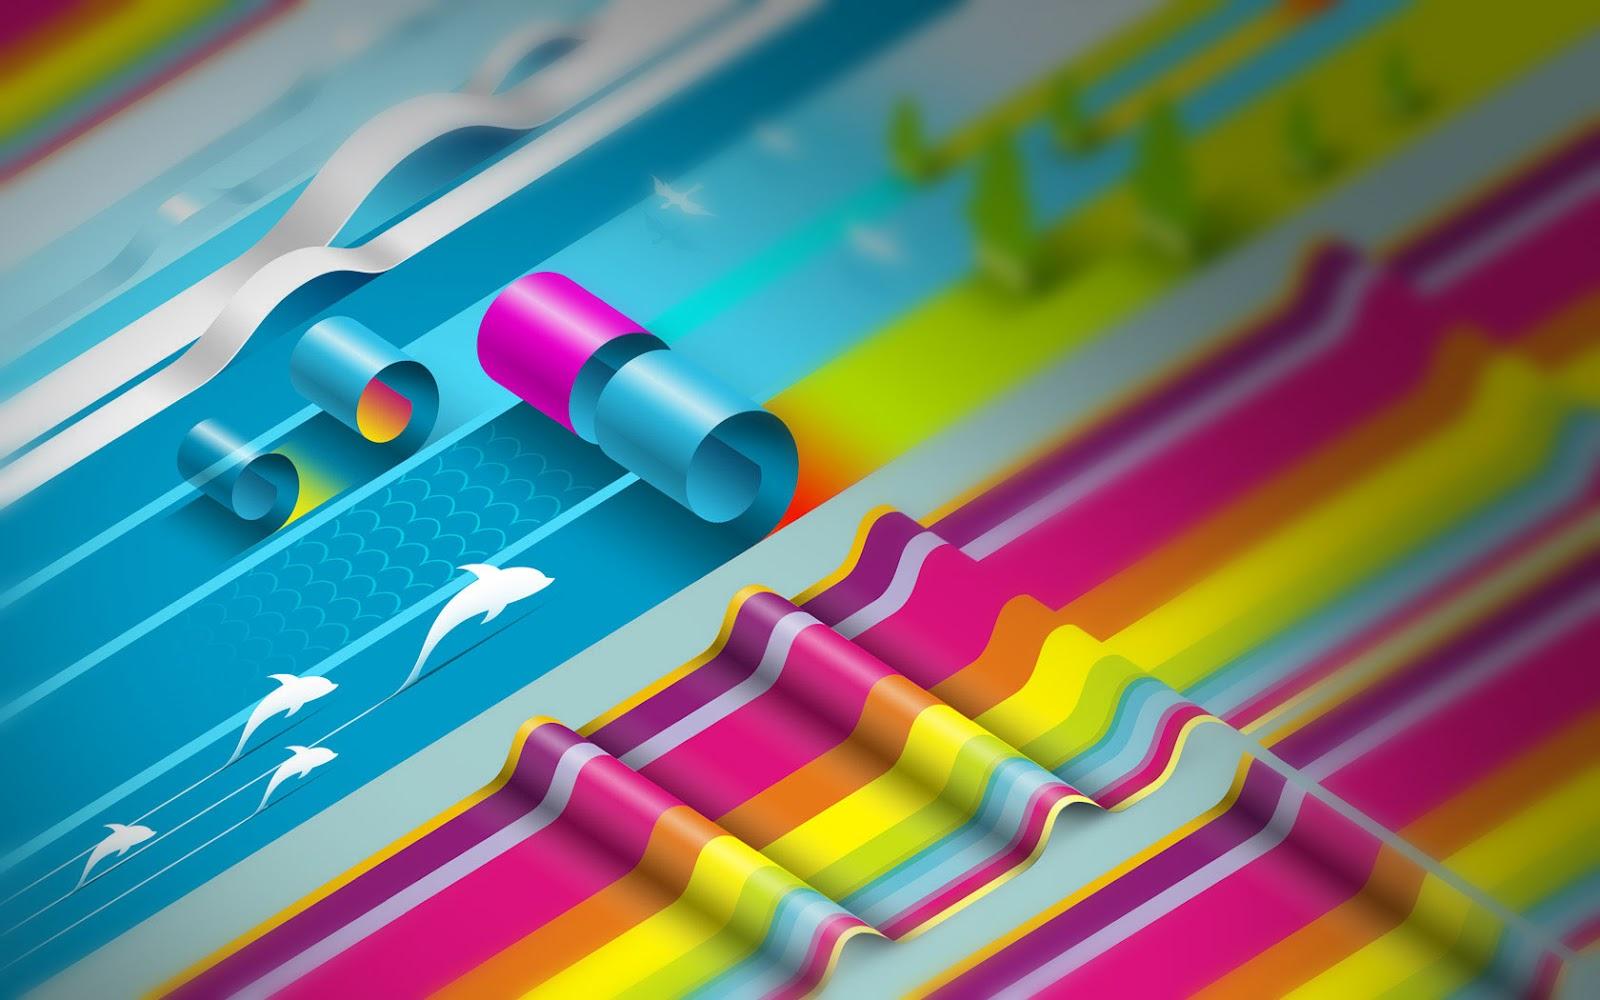 http://4.bp.blogspot.com/-83R_46thc3A/T40Rge-PAwI/AAAAAAAAAmo/R-Tq-glu0Yo/s1600/colorful_paper_roll-wide.jpg